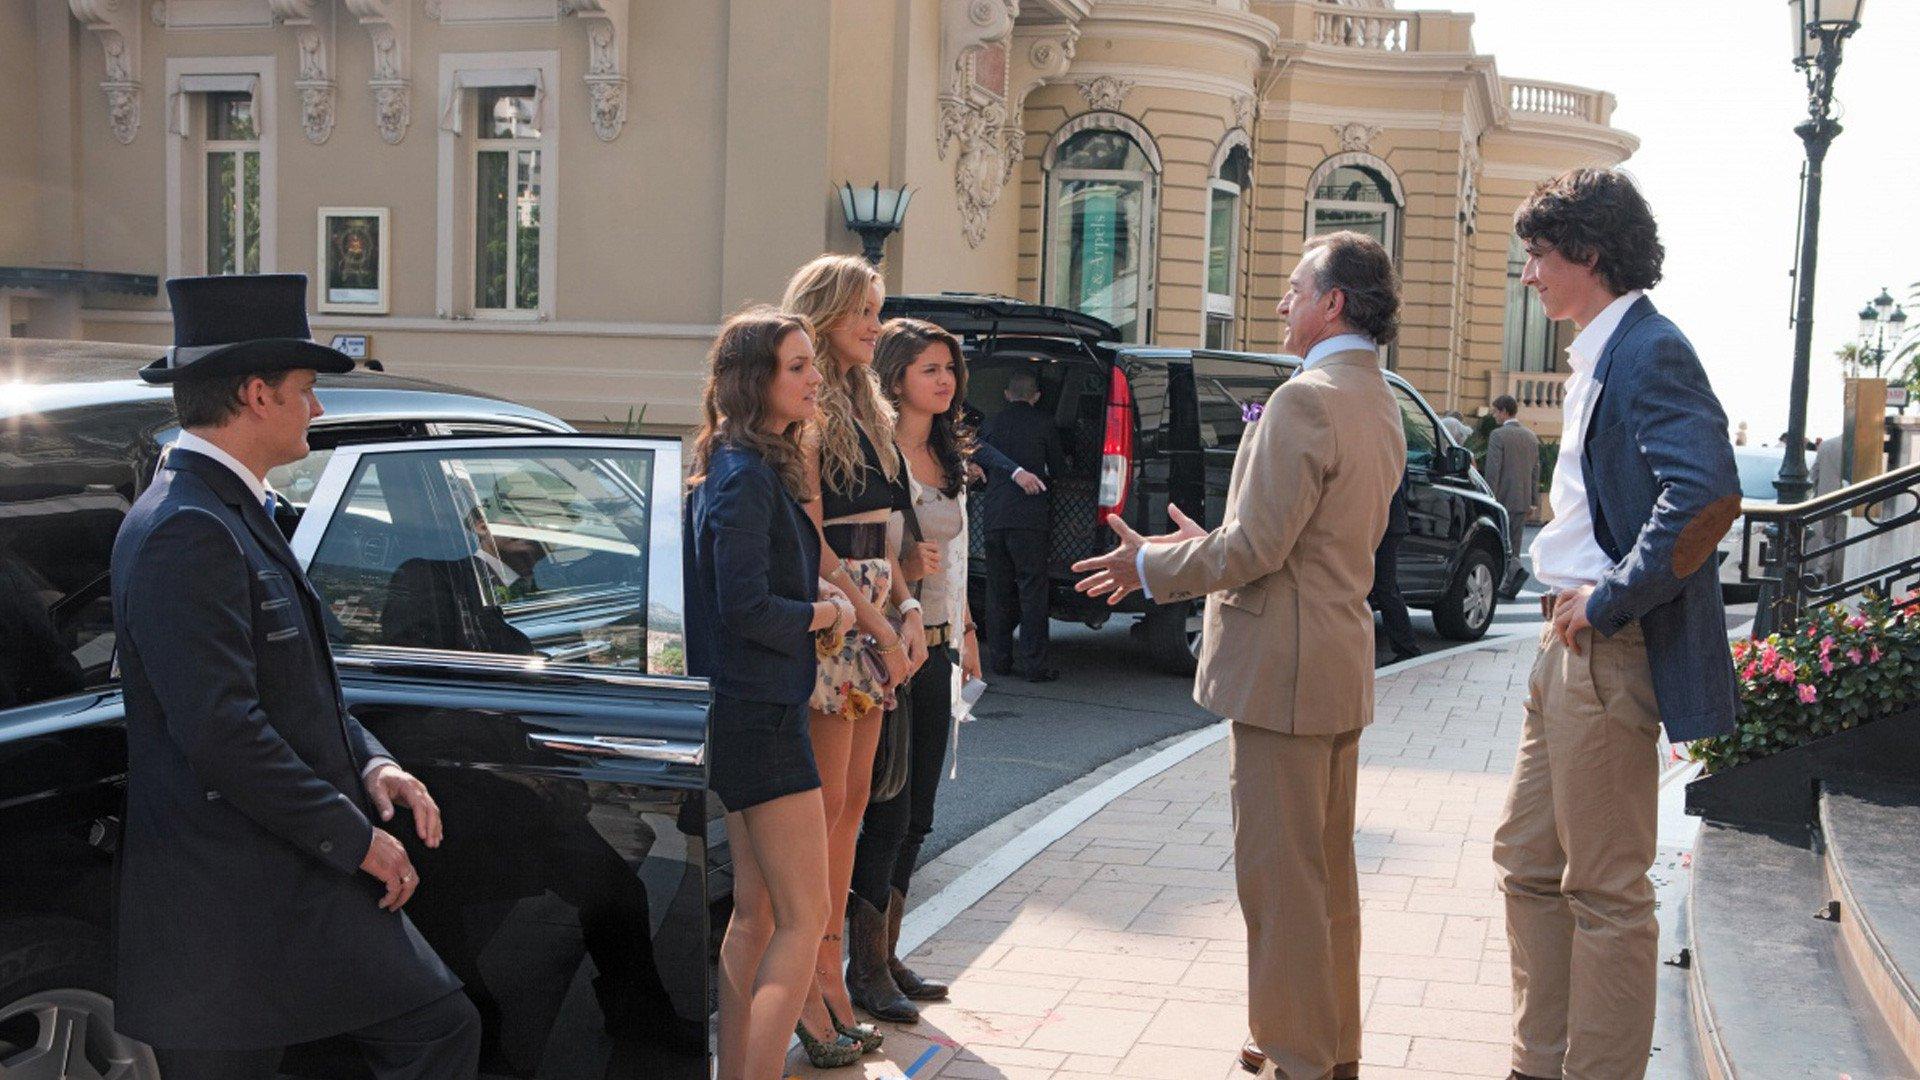 Монте-Карло смотреть фото